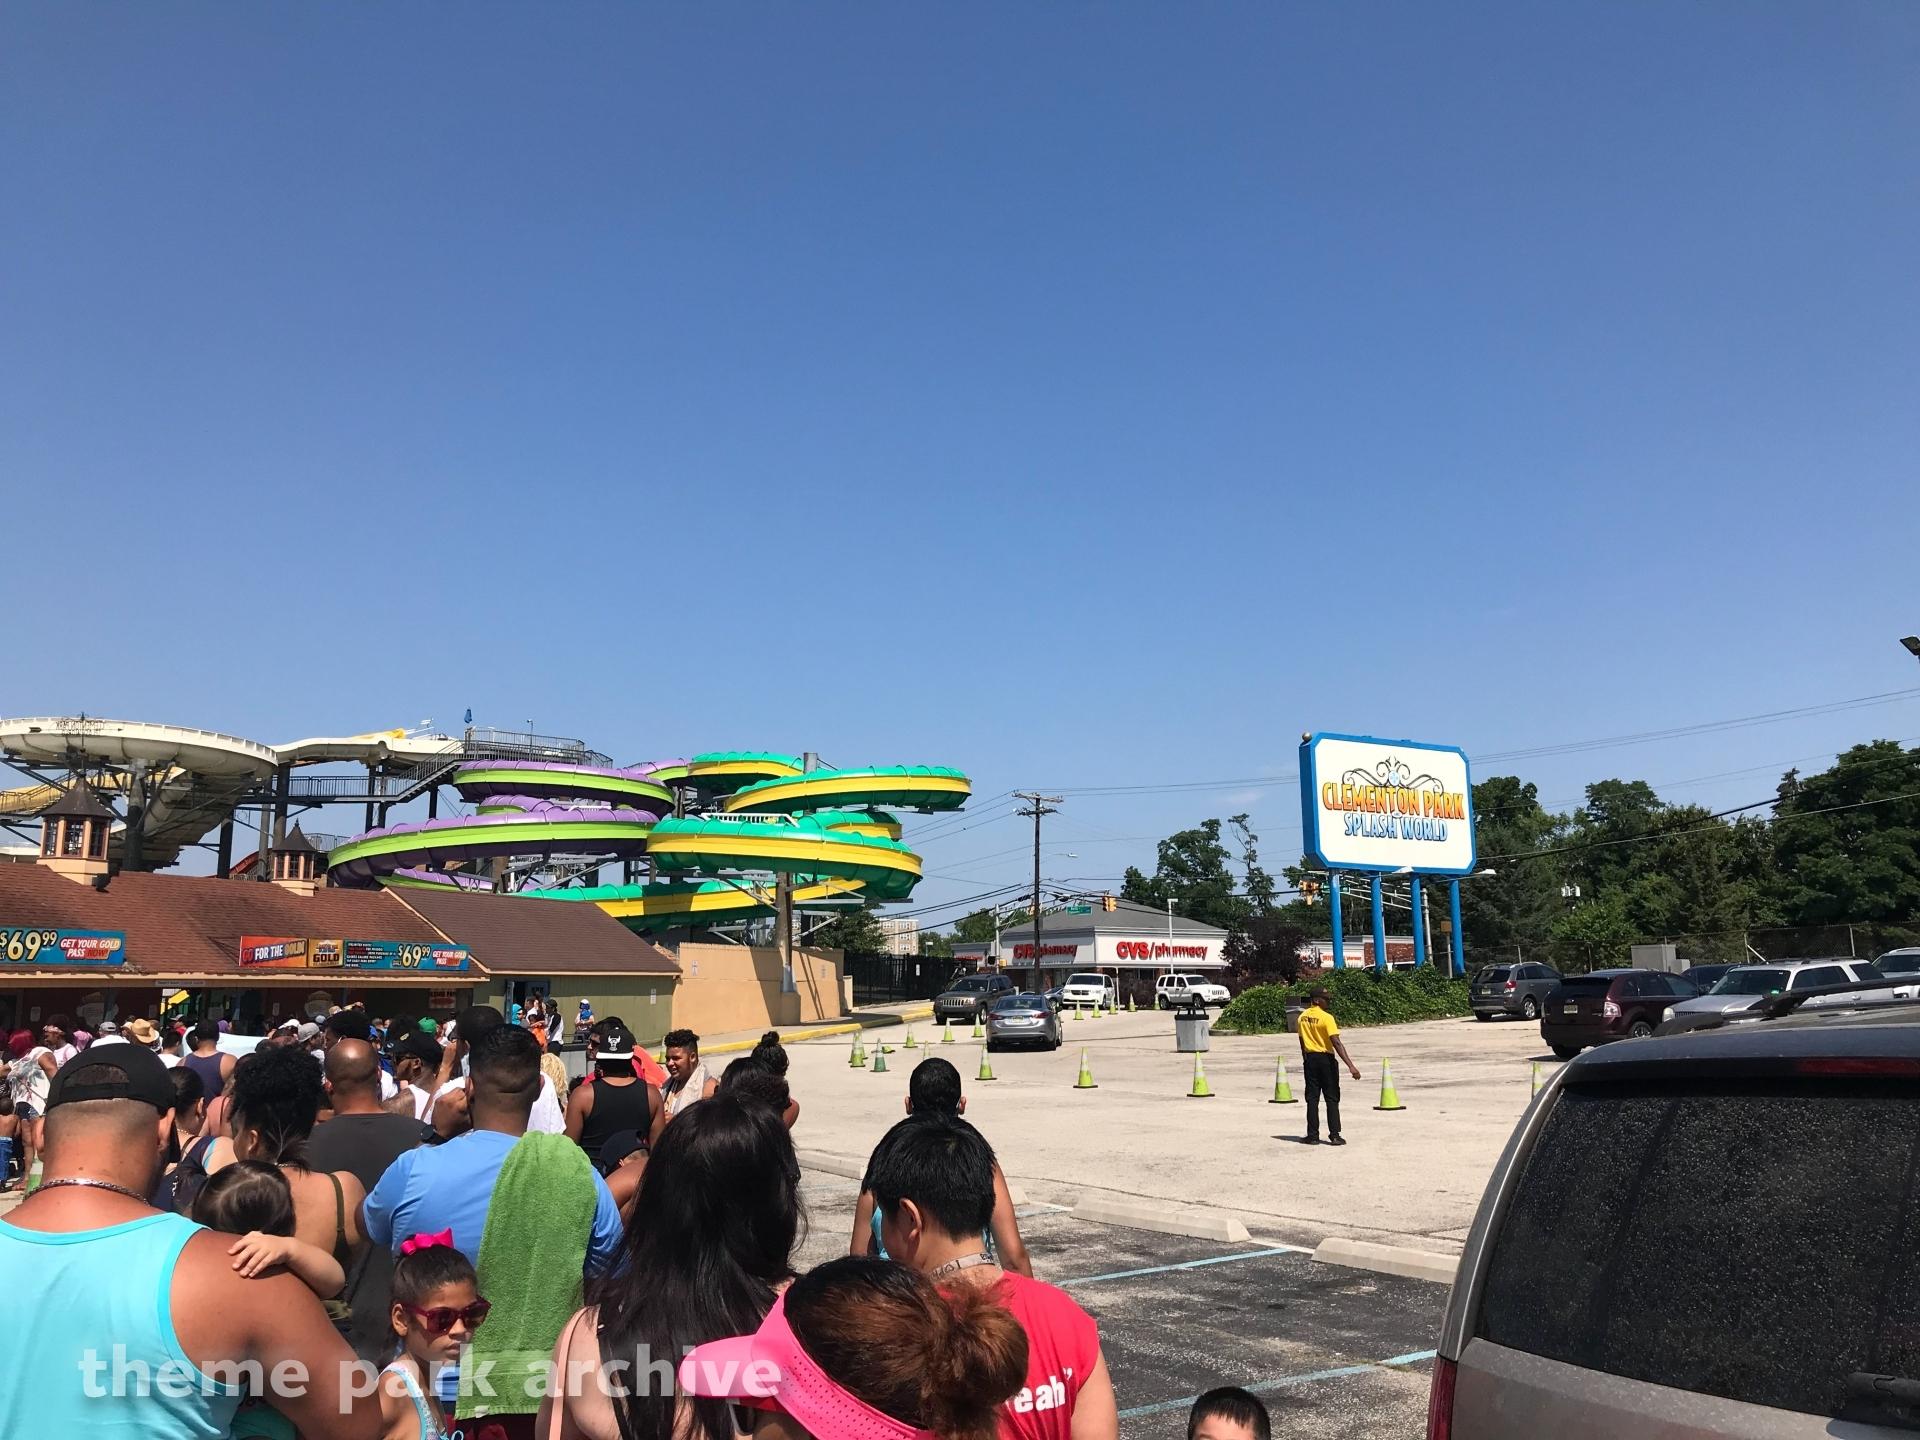 Entrance at Clementon Park & Splash World